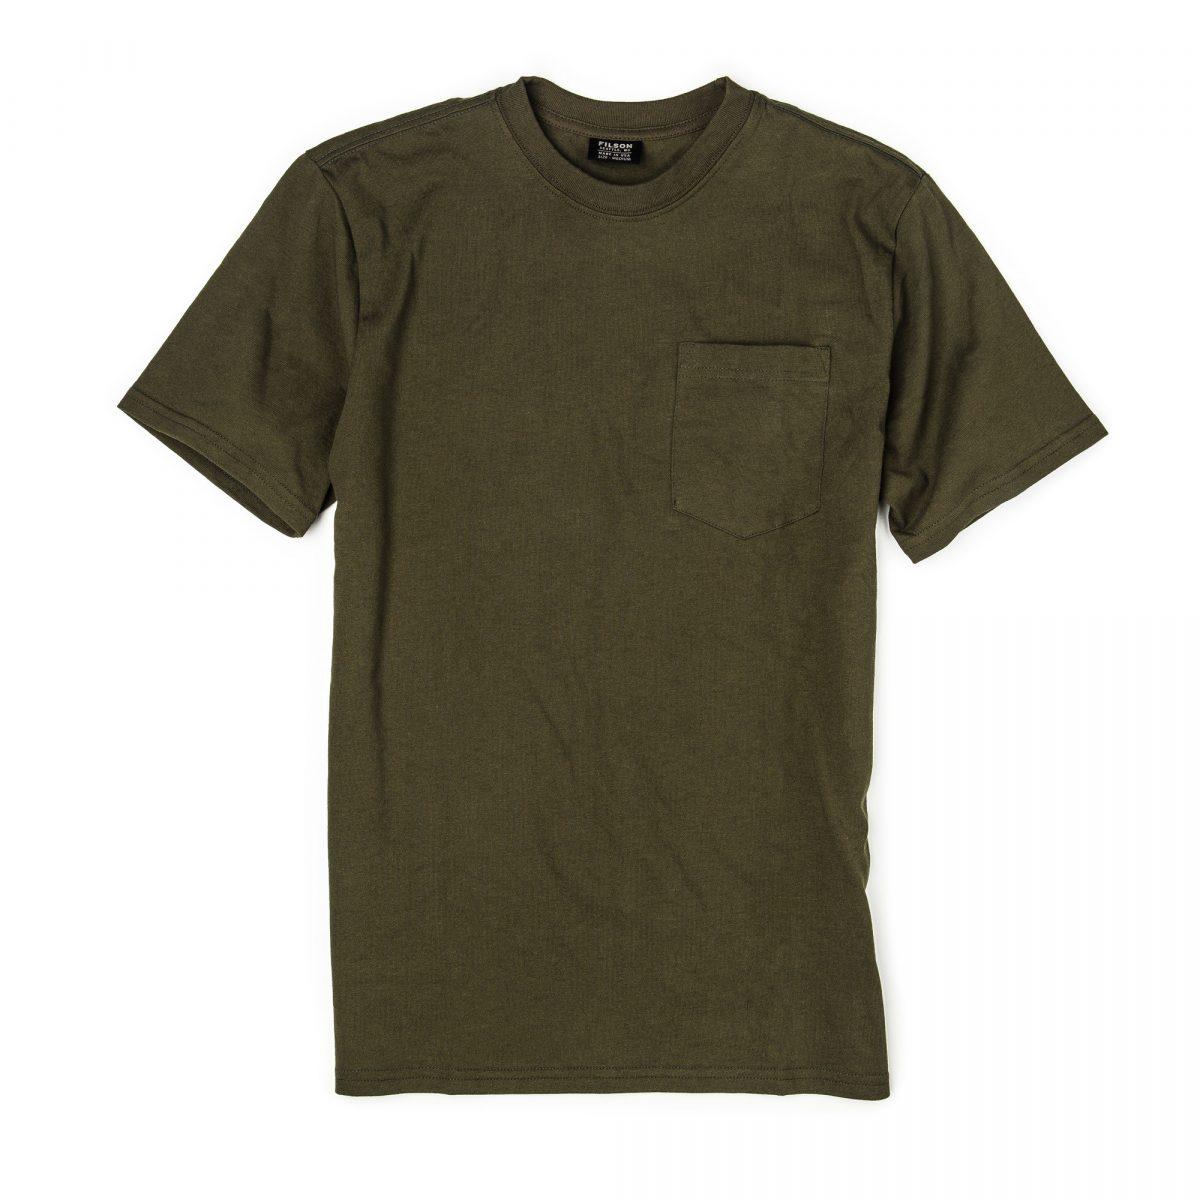 shirts-3170-edit